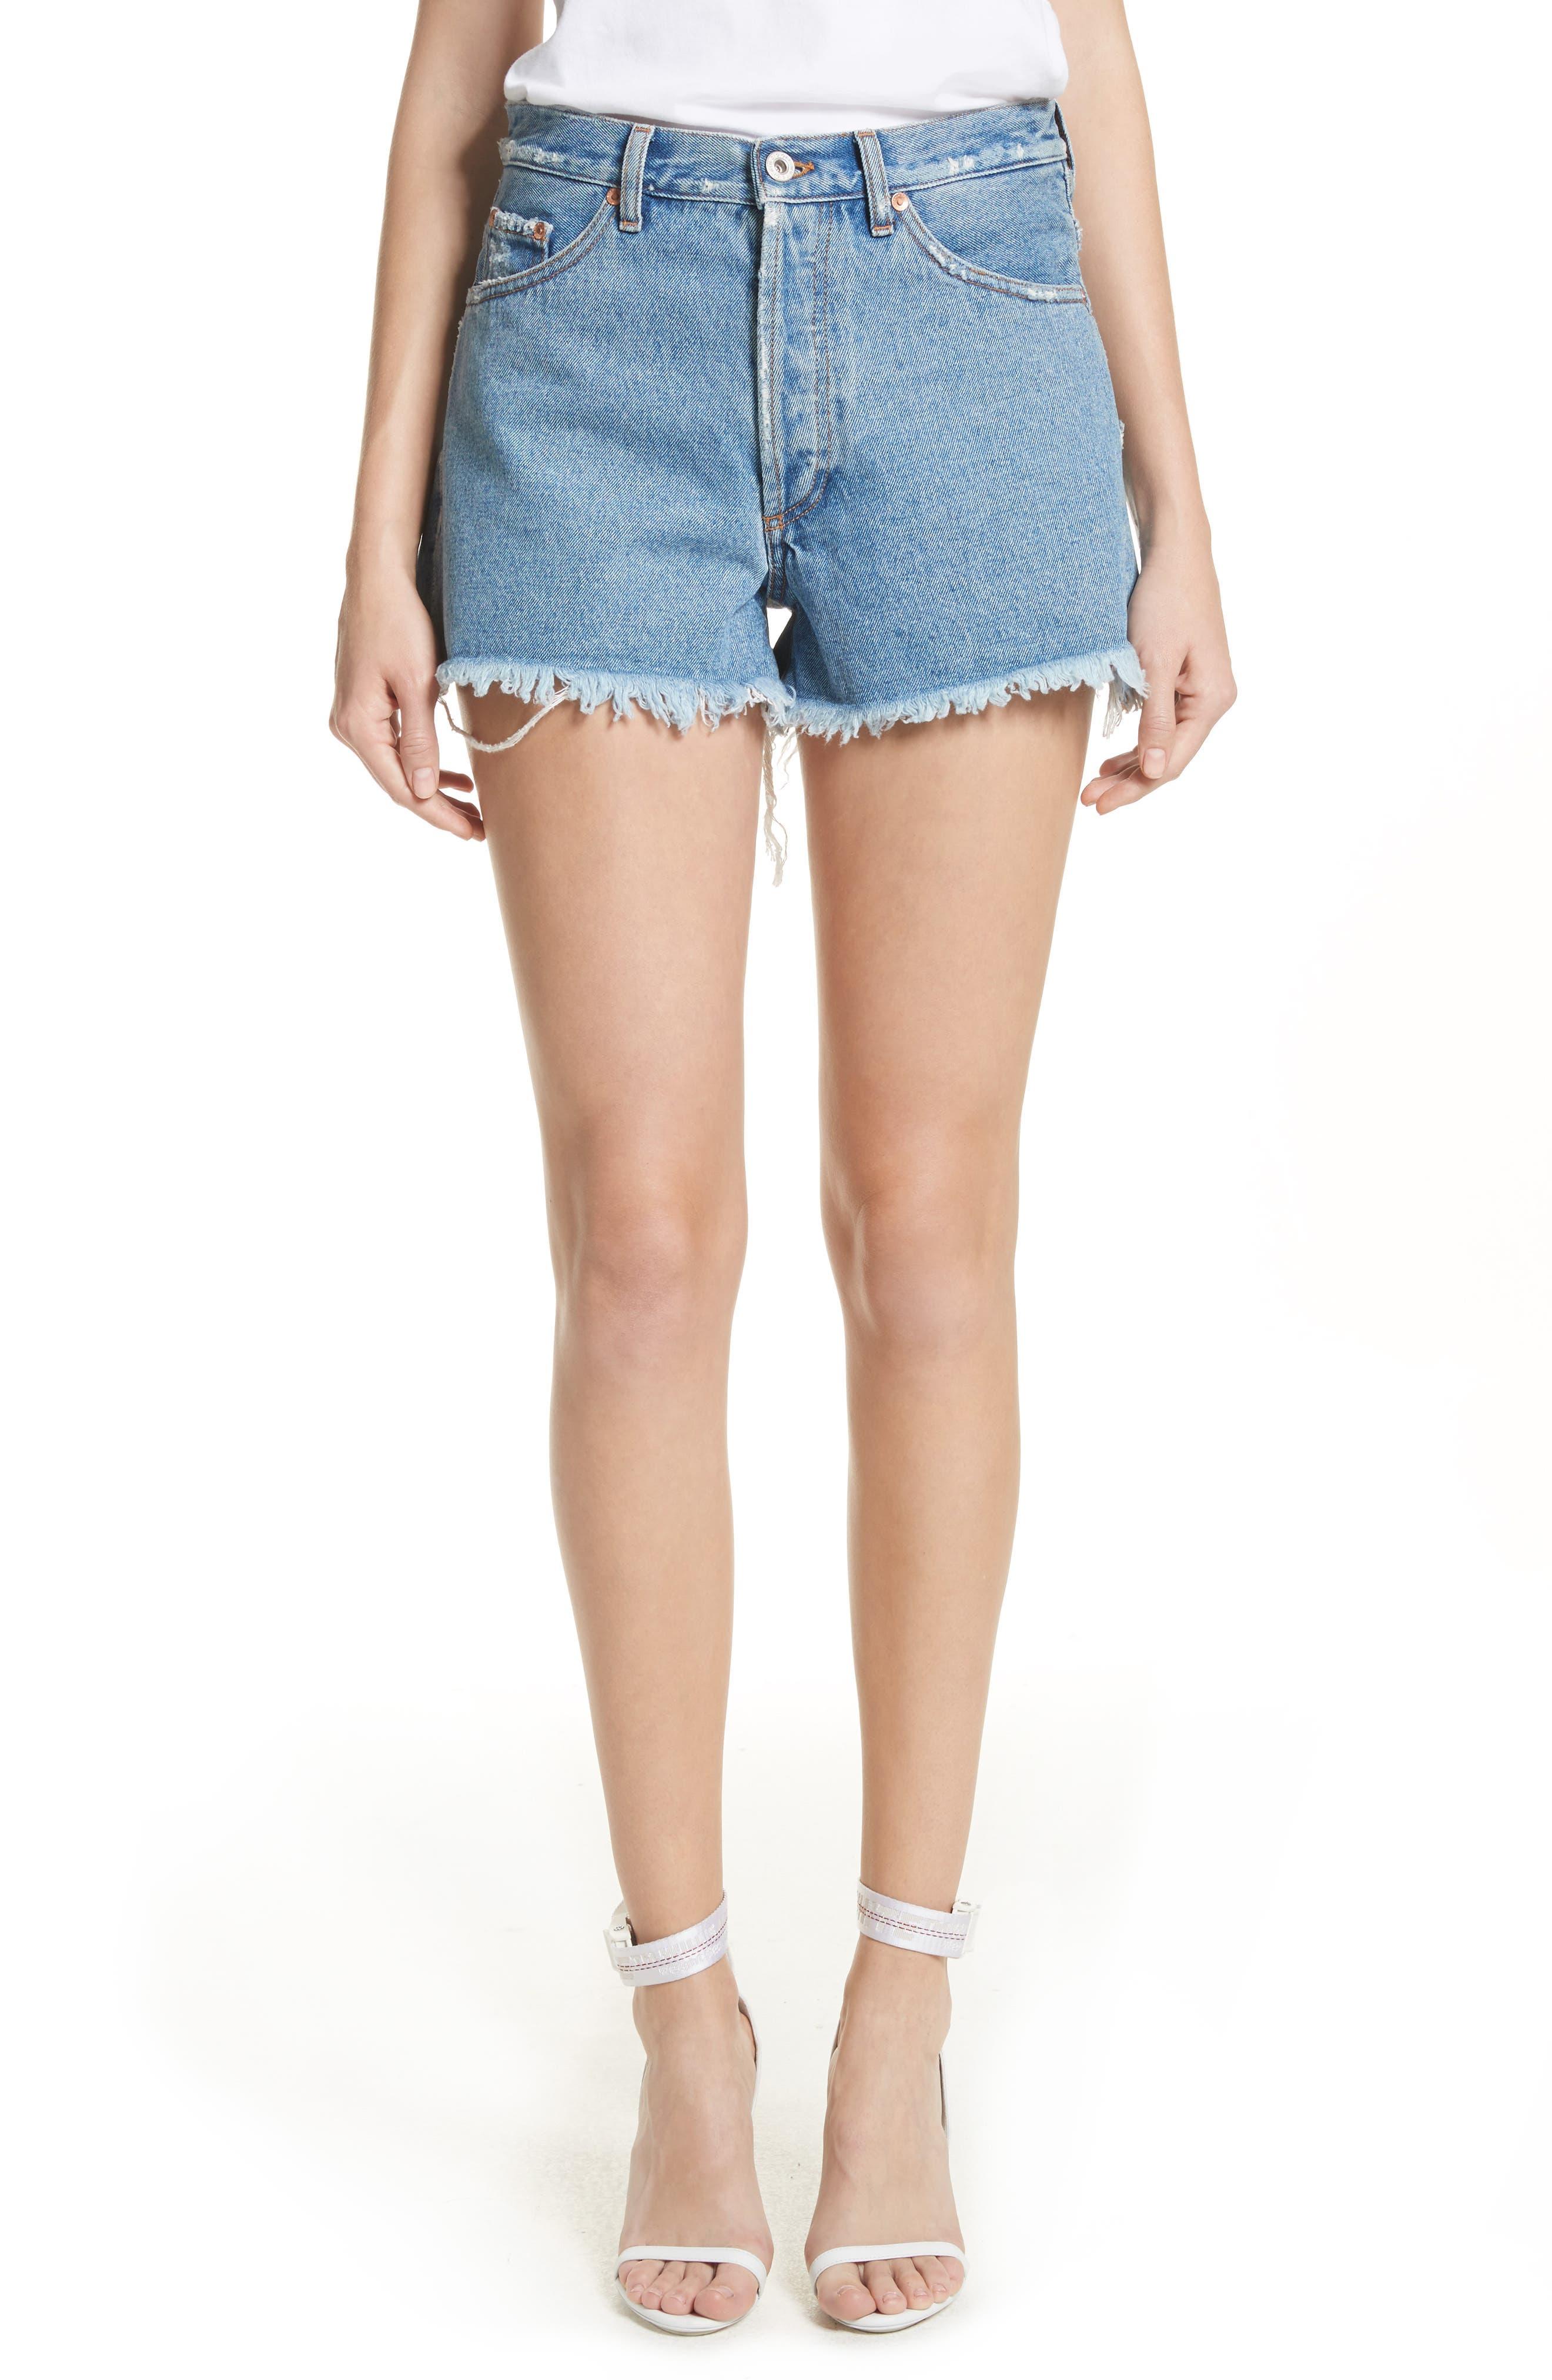 Off-White Diagonal Flower Shop Cutoff Denim Shorts